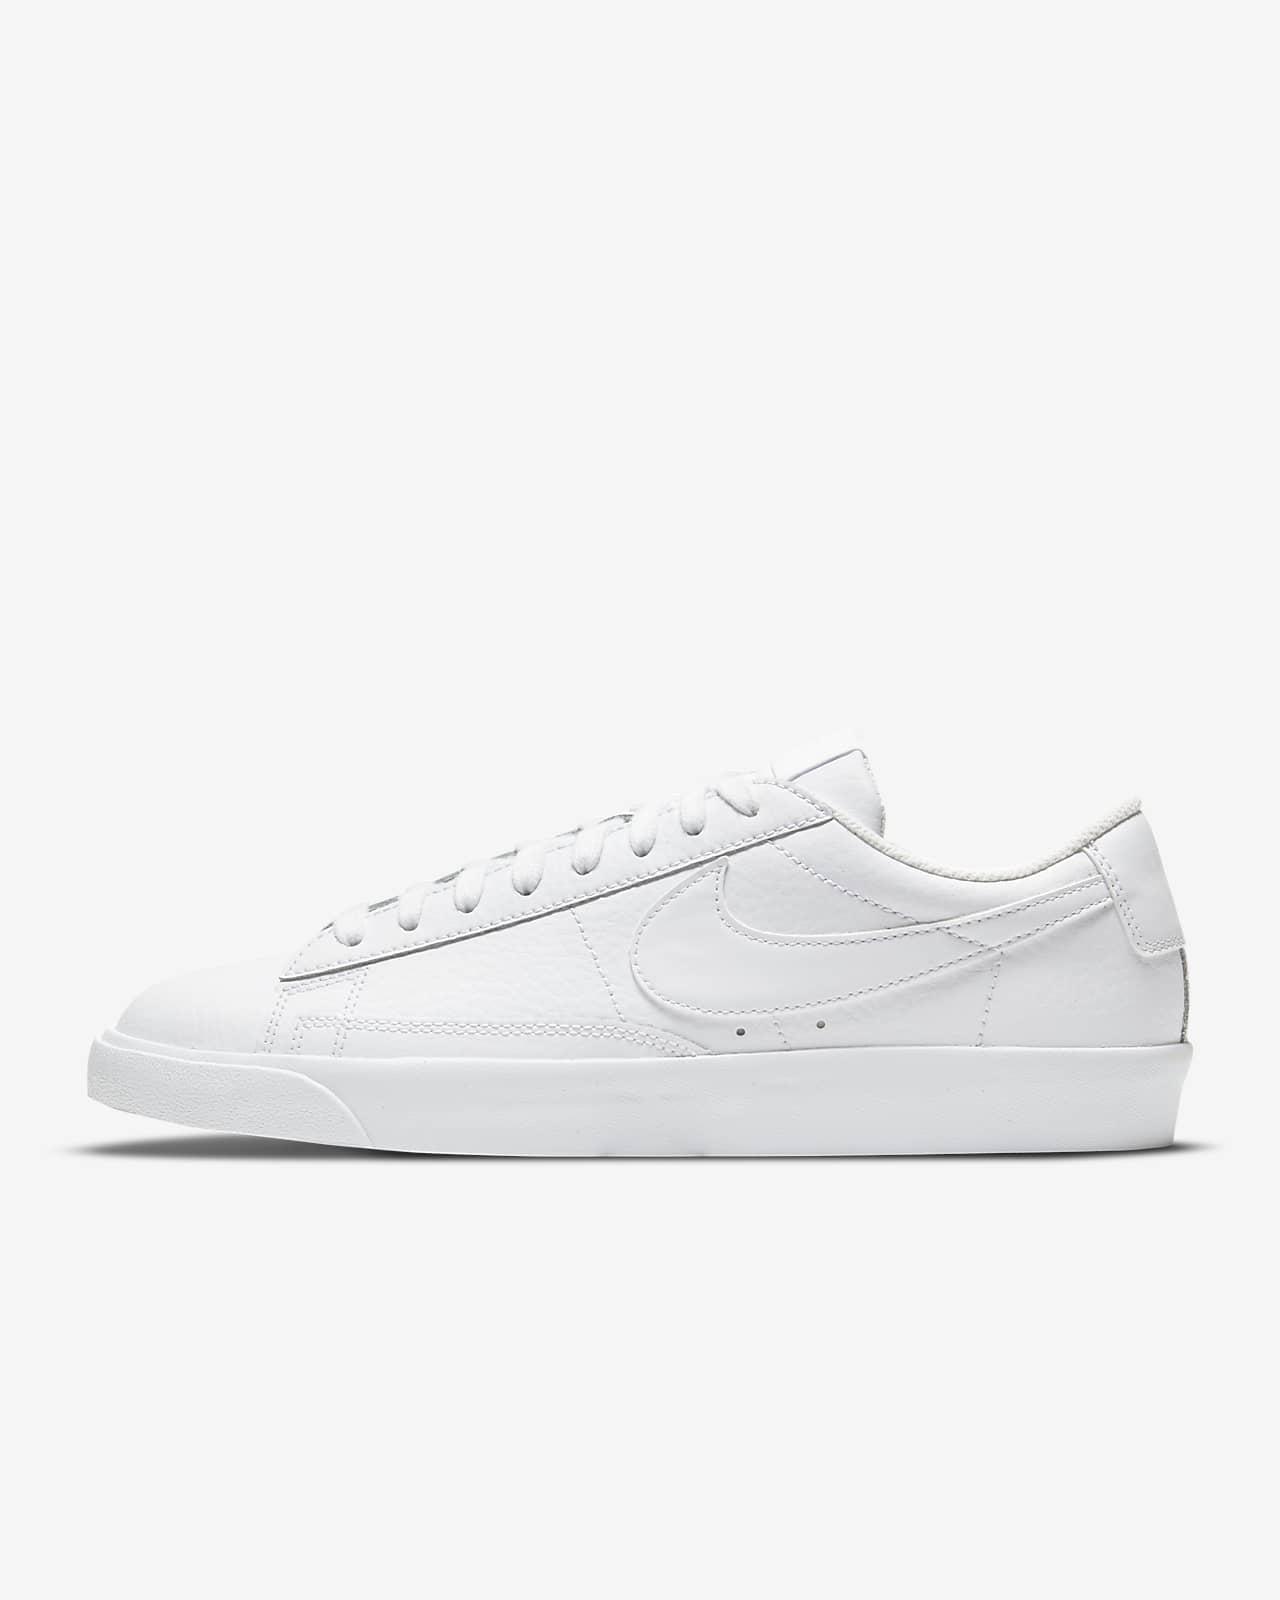 Nike Blazer Low LE Men's Shoe